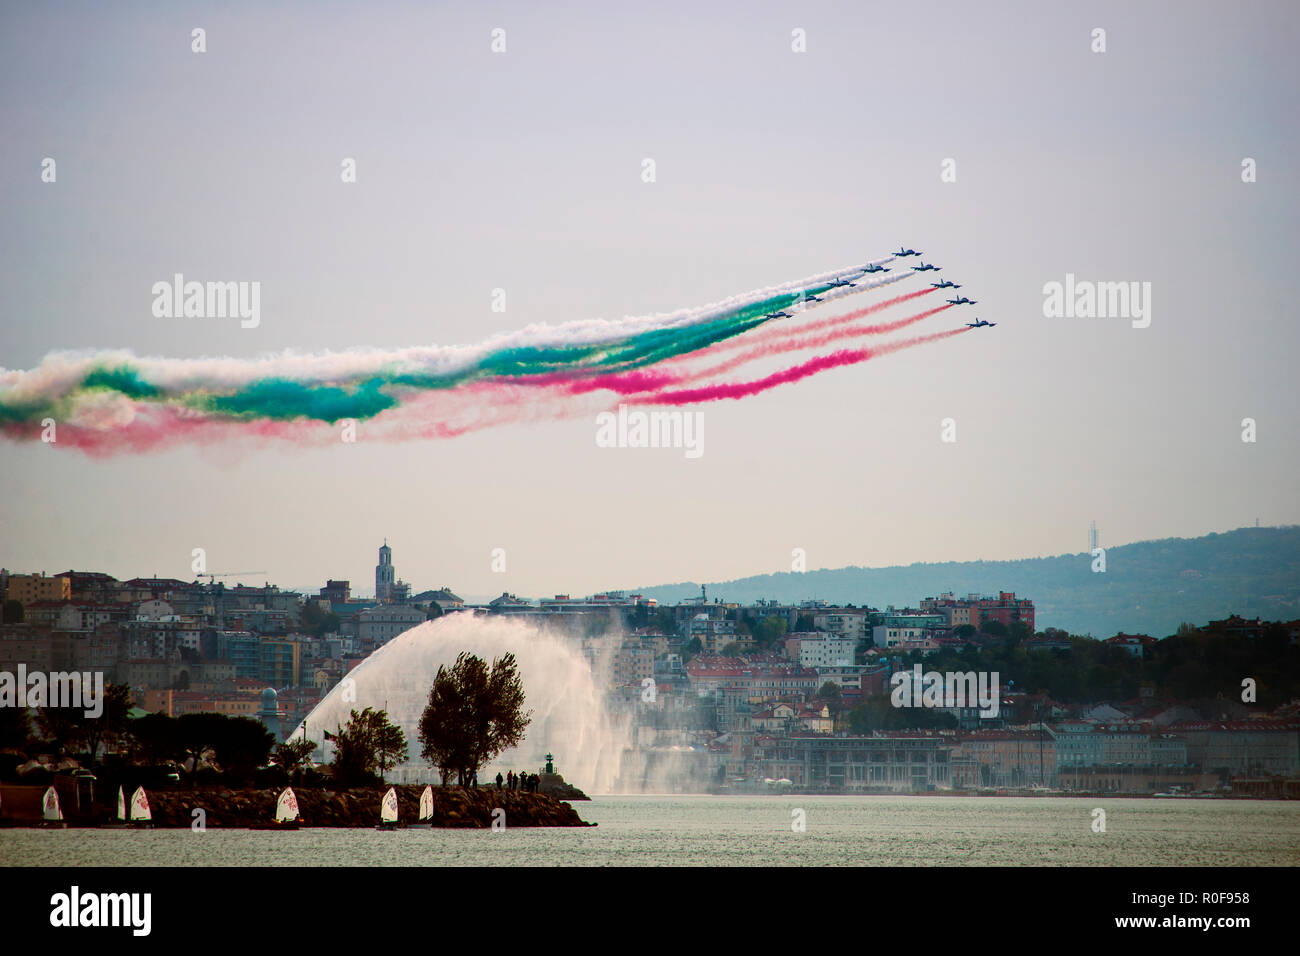 4 11 2018 Trieste, Italy. Acrobatic air performance of Frecce tricolori -- tricolour arrows. - Stock Image